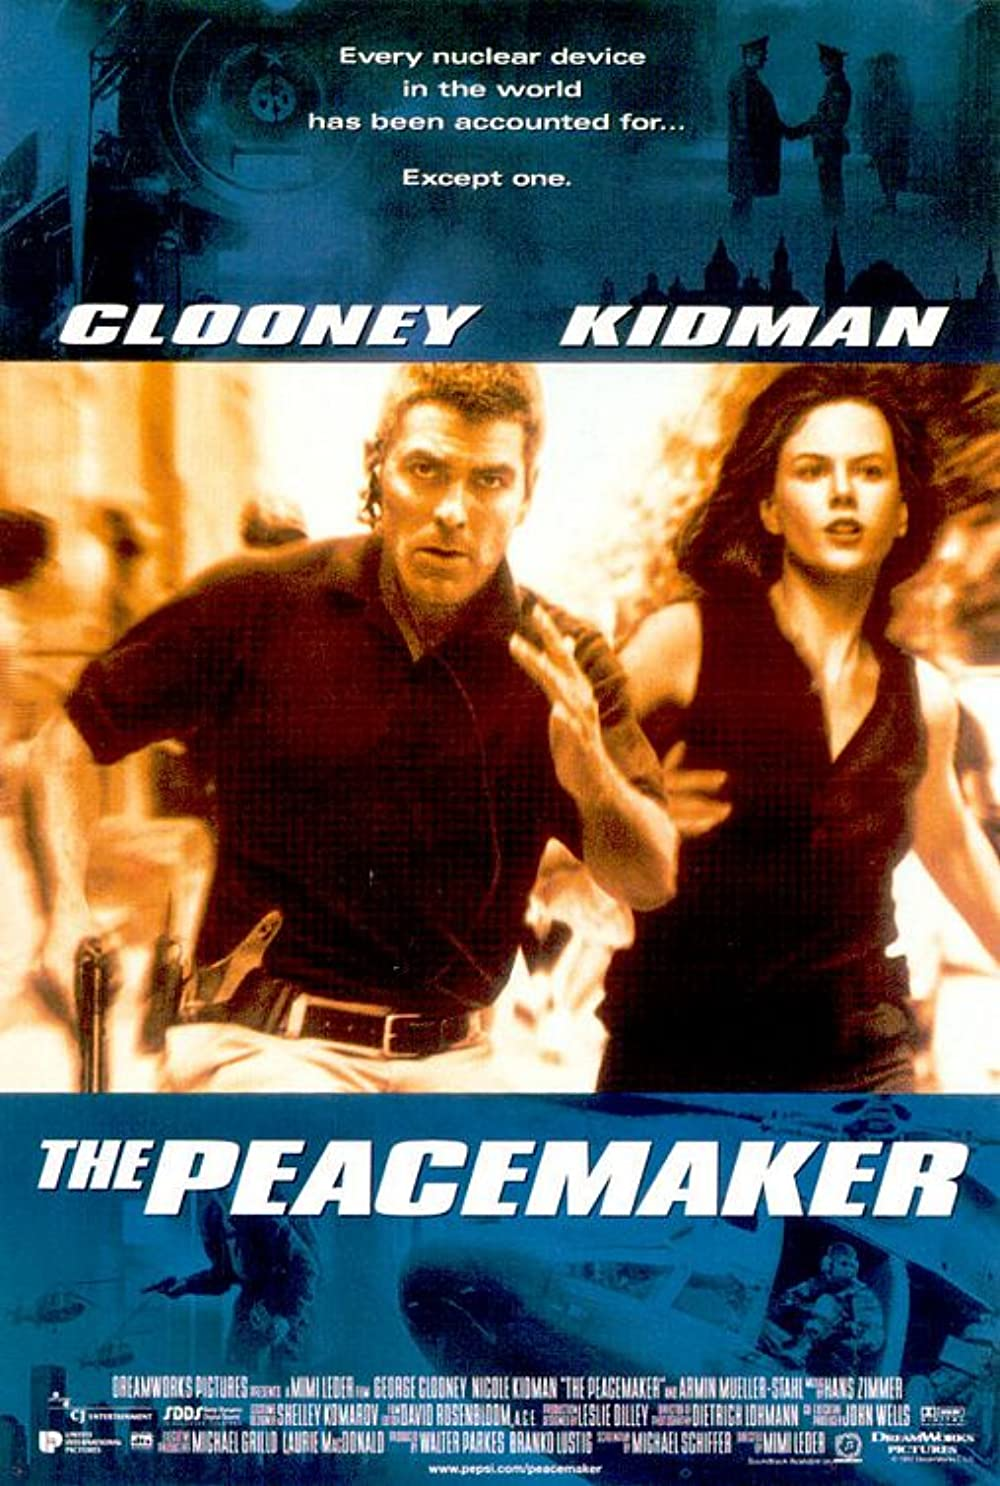 Download The Peacemaker 1997 Hindi Dual Audio 1080p BluRay ESub 1.9GB